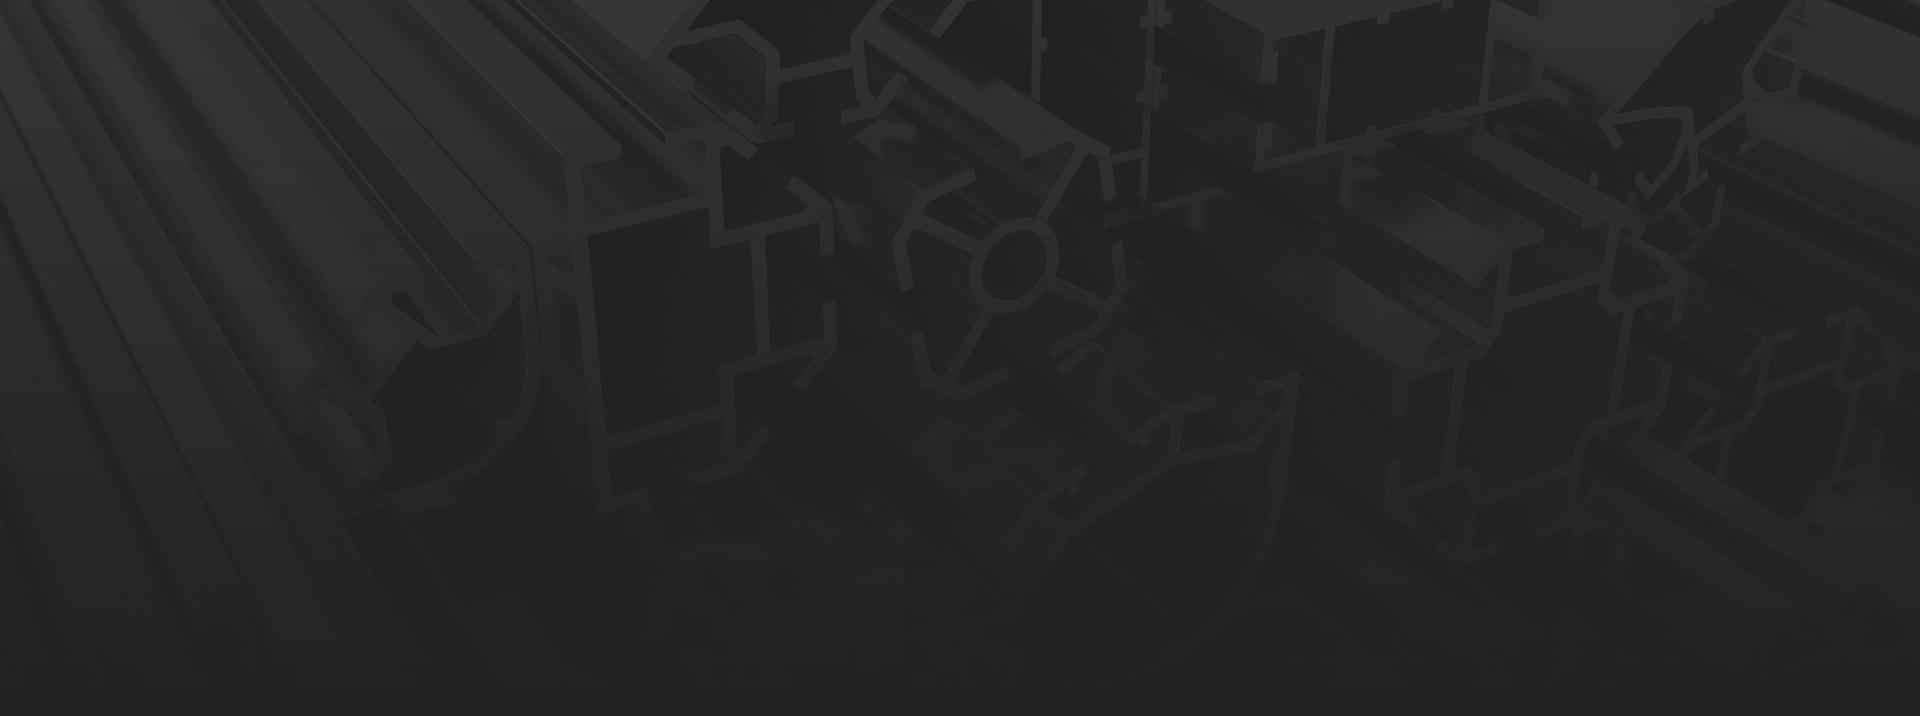 Emmegisoft Slide News 02